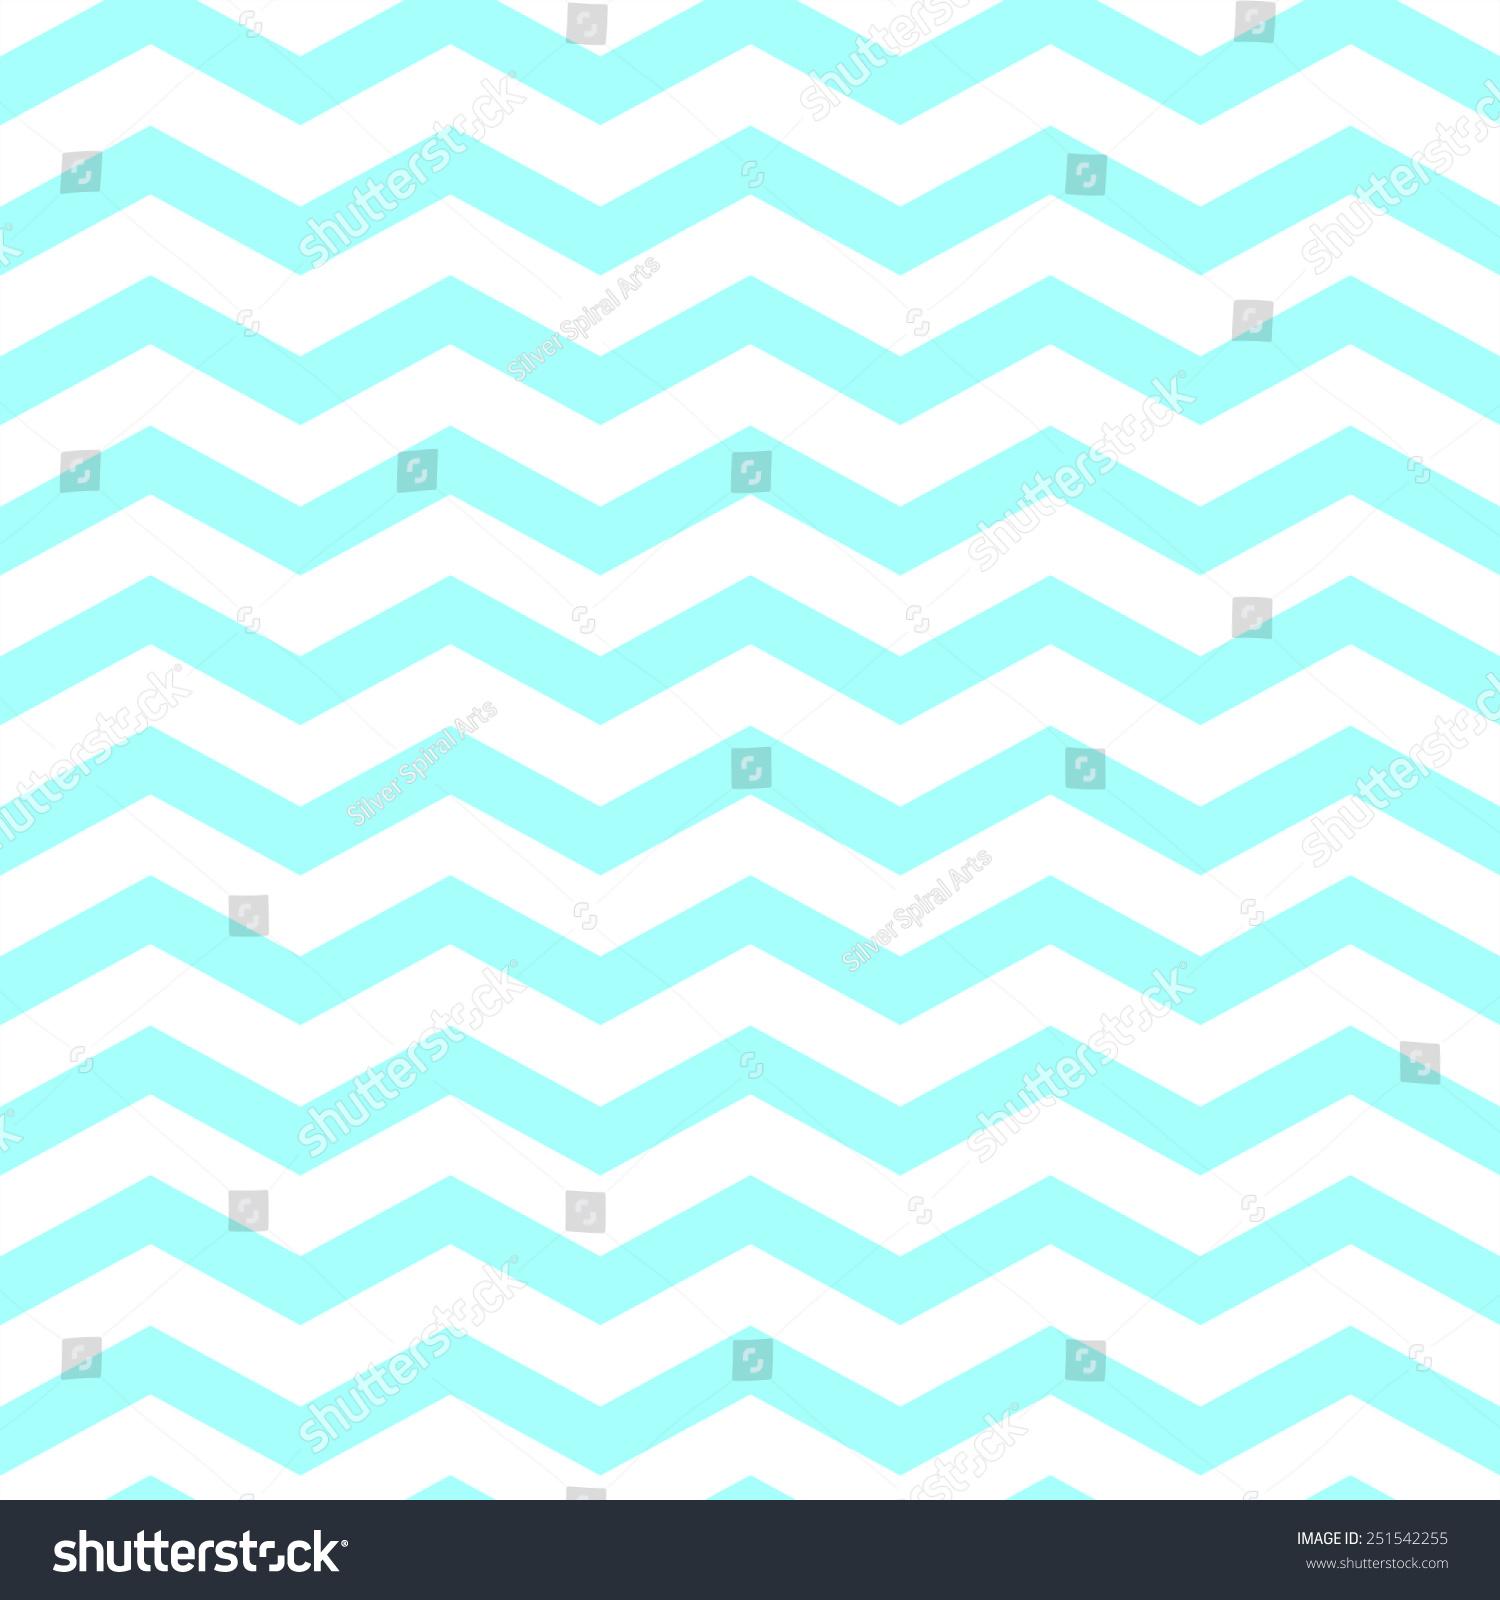 Teal chevron print background teal chevron background patterns - Teal Aqua Blue White Chevron Pattern Stock Illustration